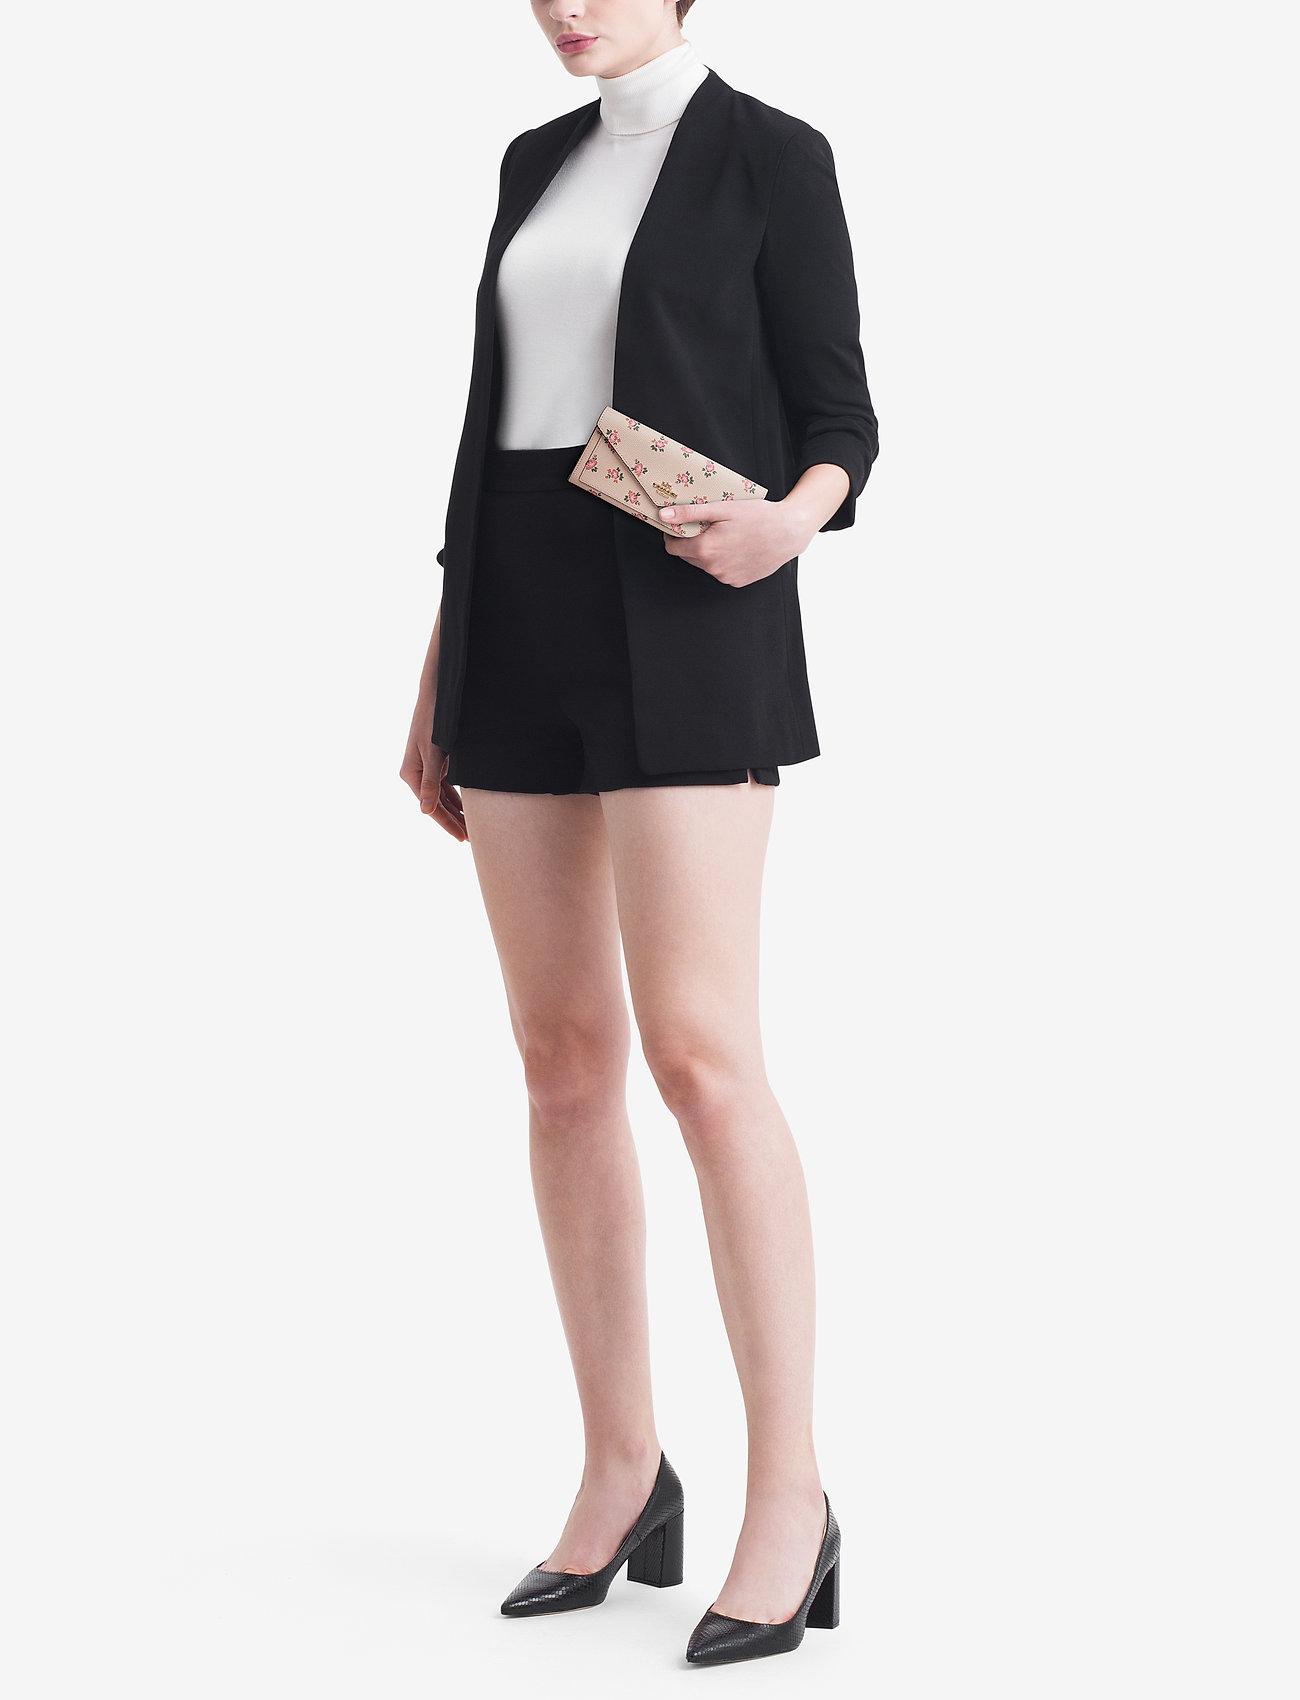 Coach Floral Bloom Soft Wallet - LI/BEECHWOOD FLORAL BLOOM PVC